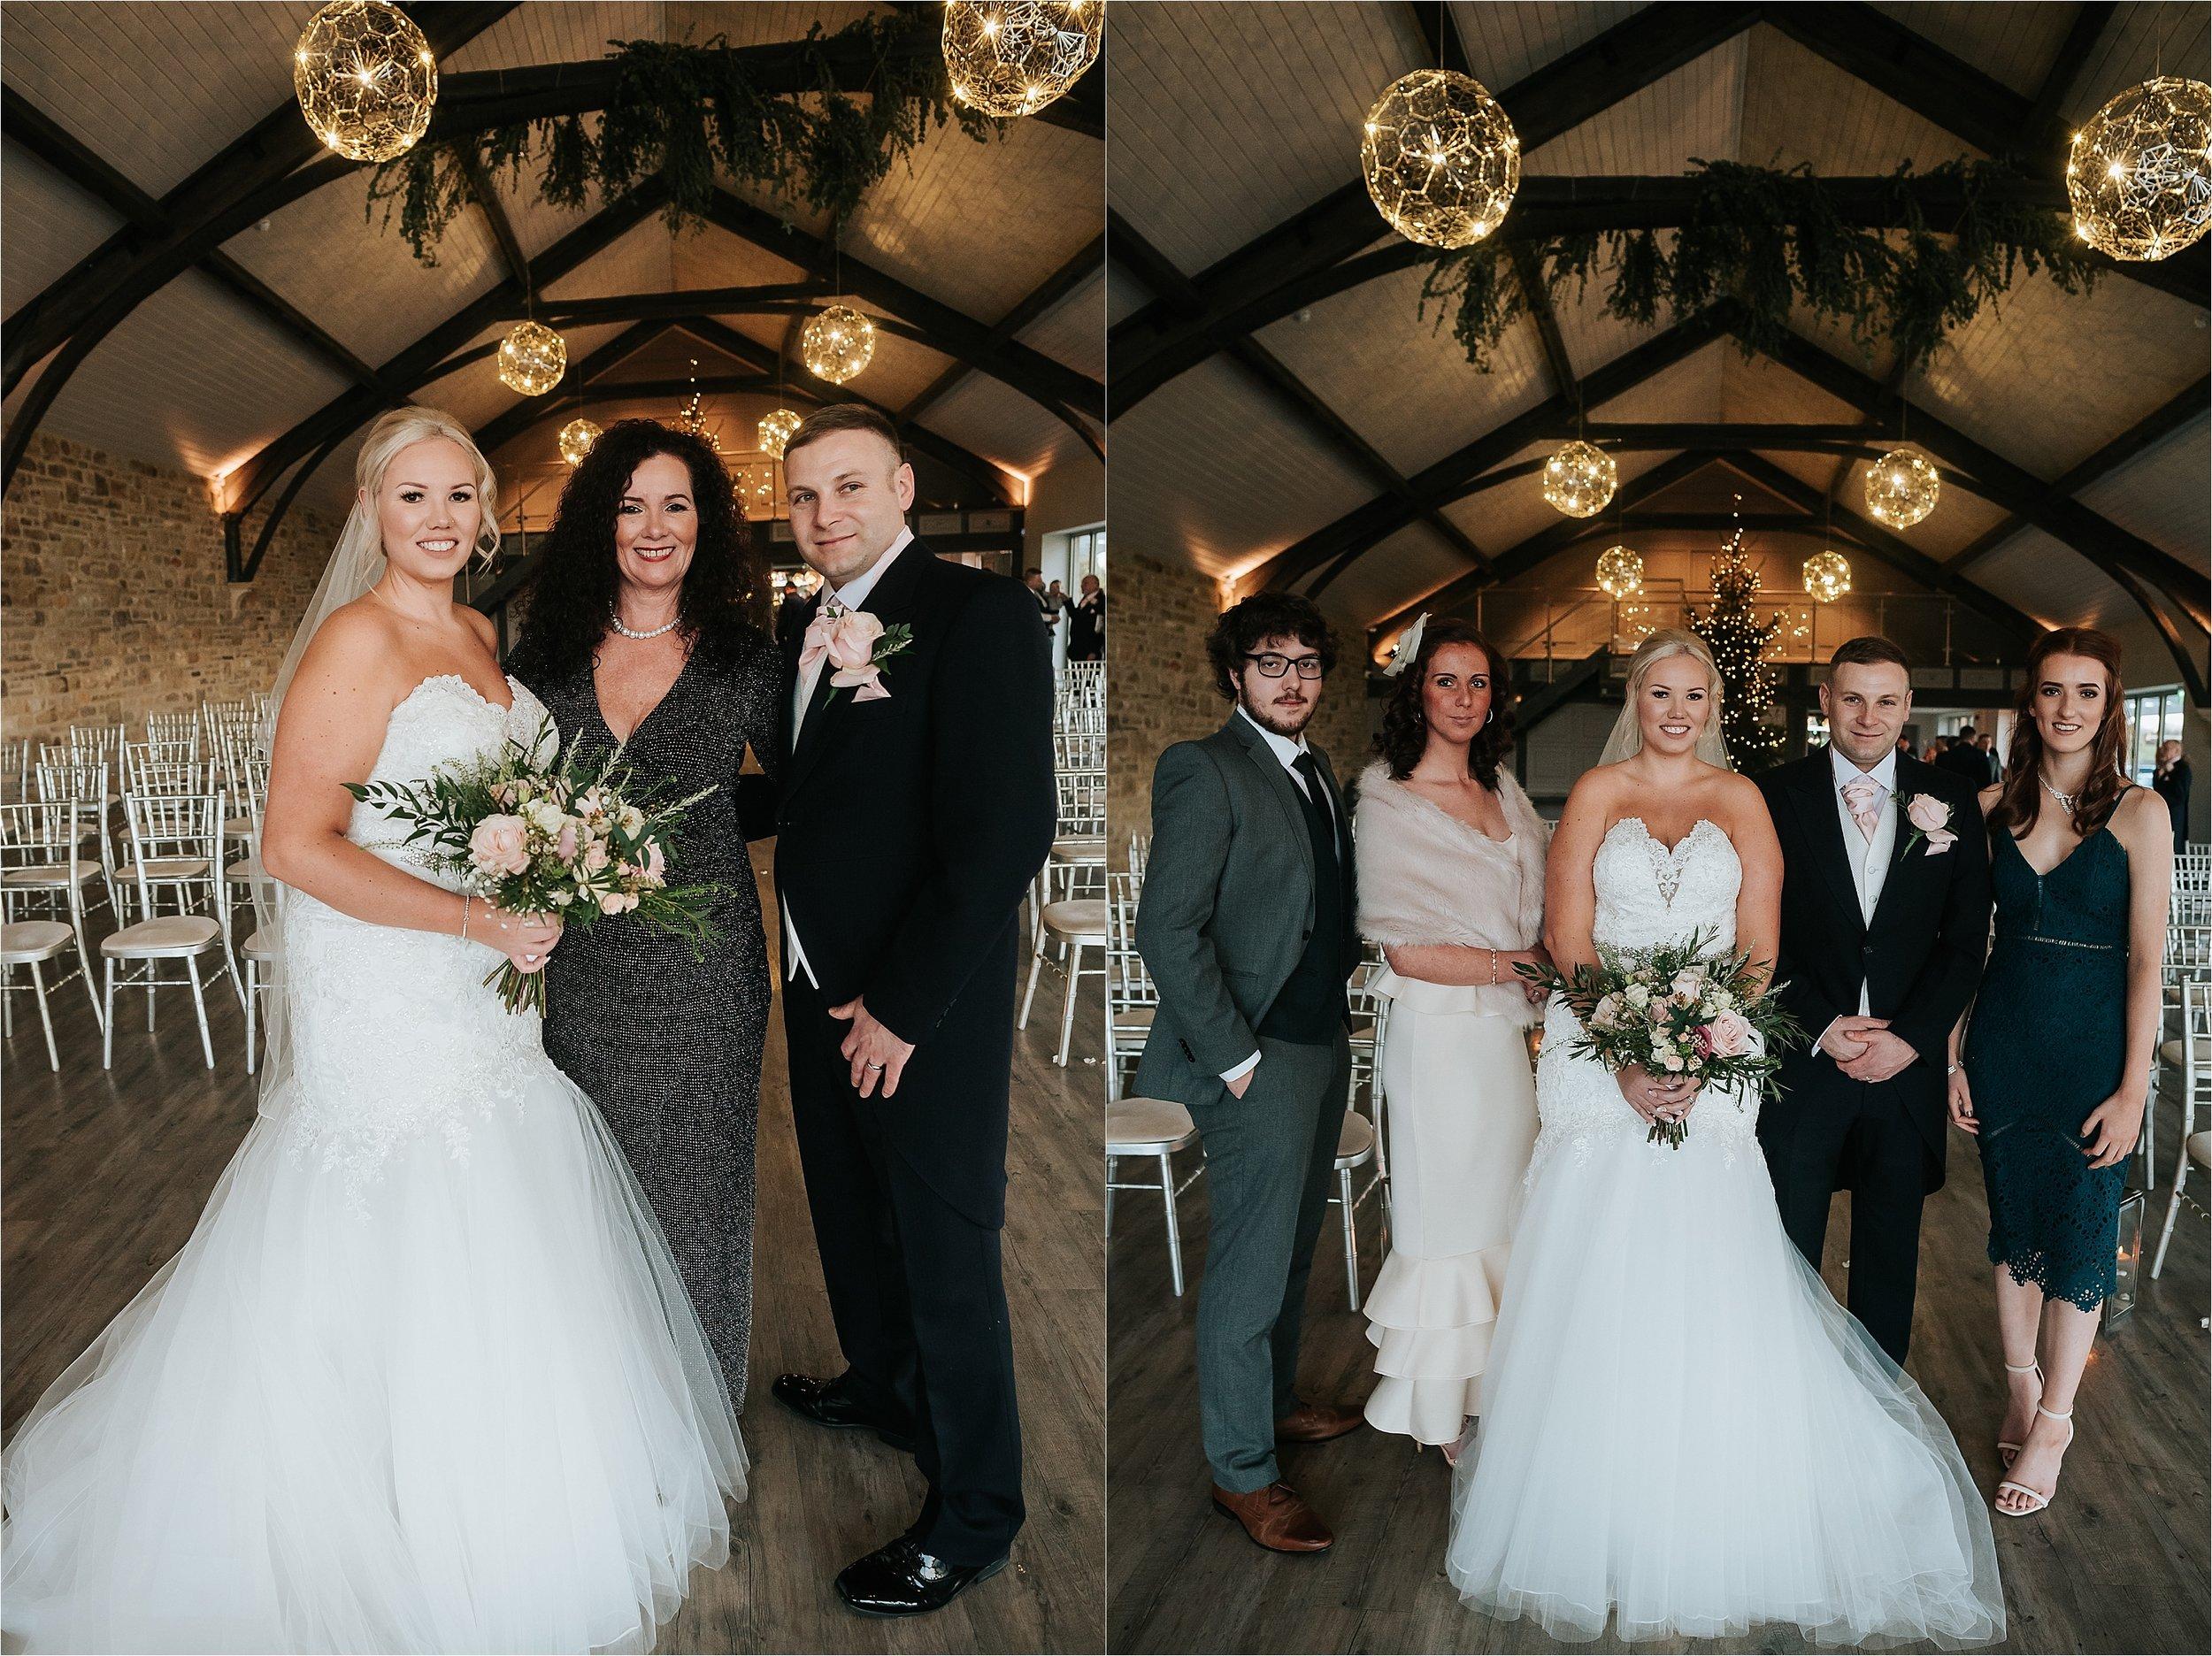 wedding group portraits indoors